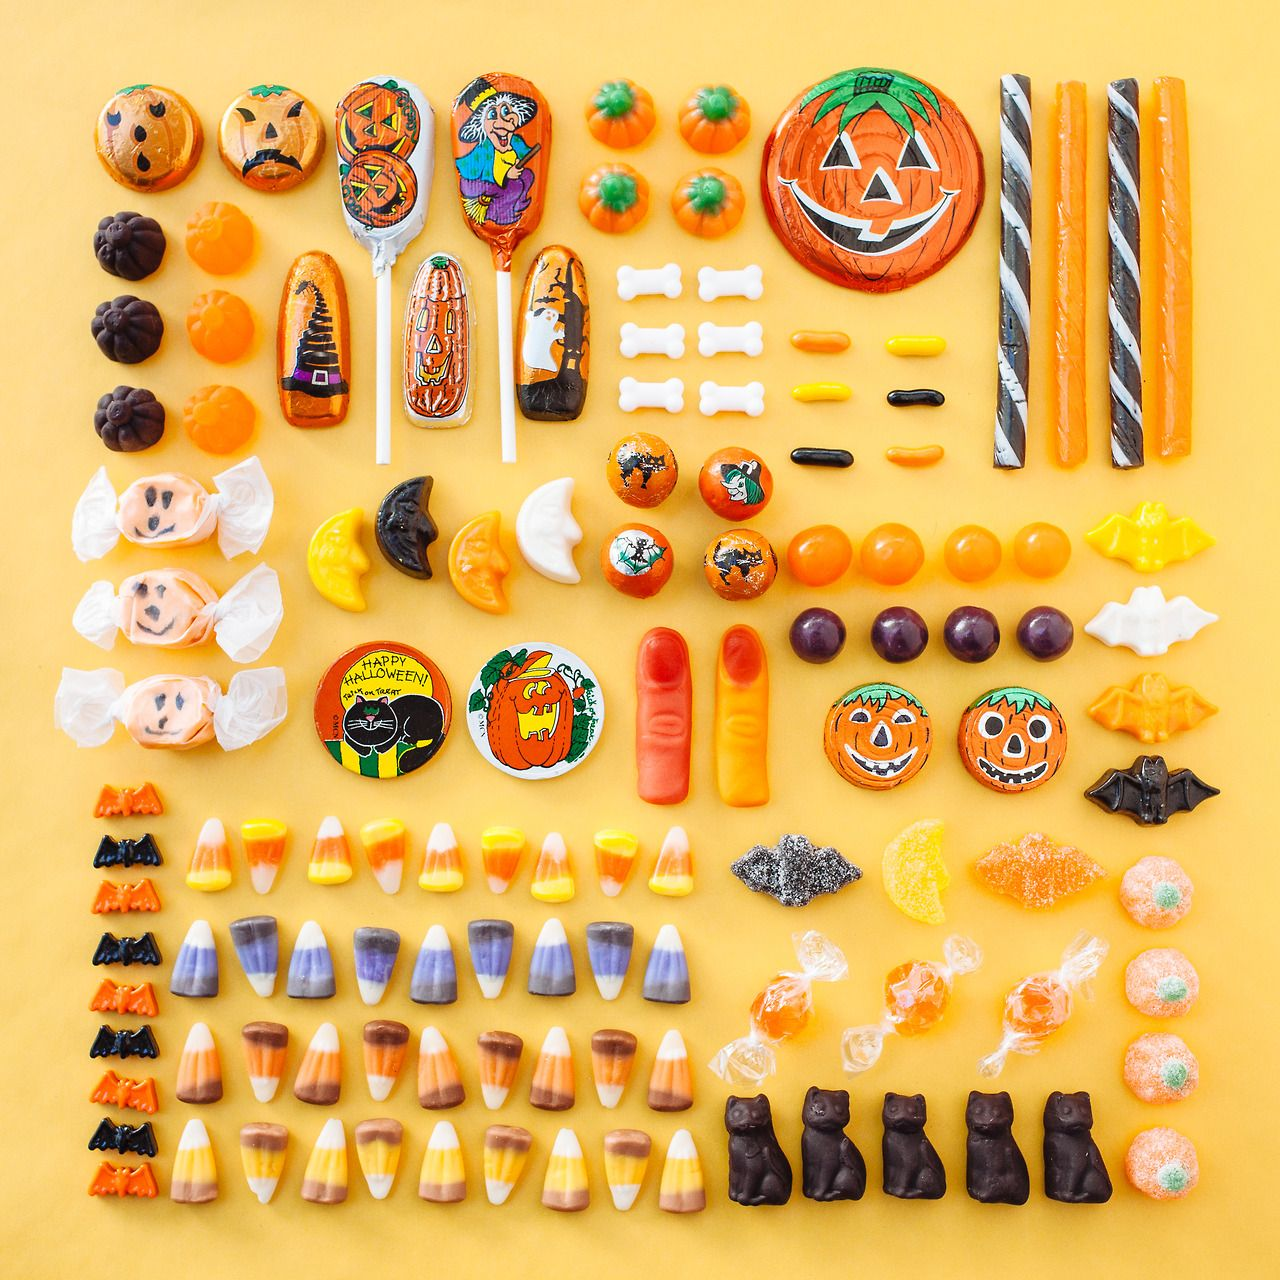 the sugar series: halloween edition emily blincoe(prints) october 2013